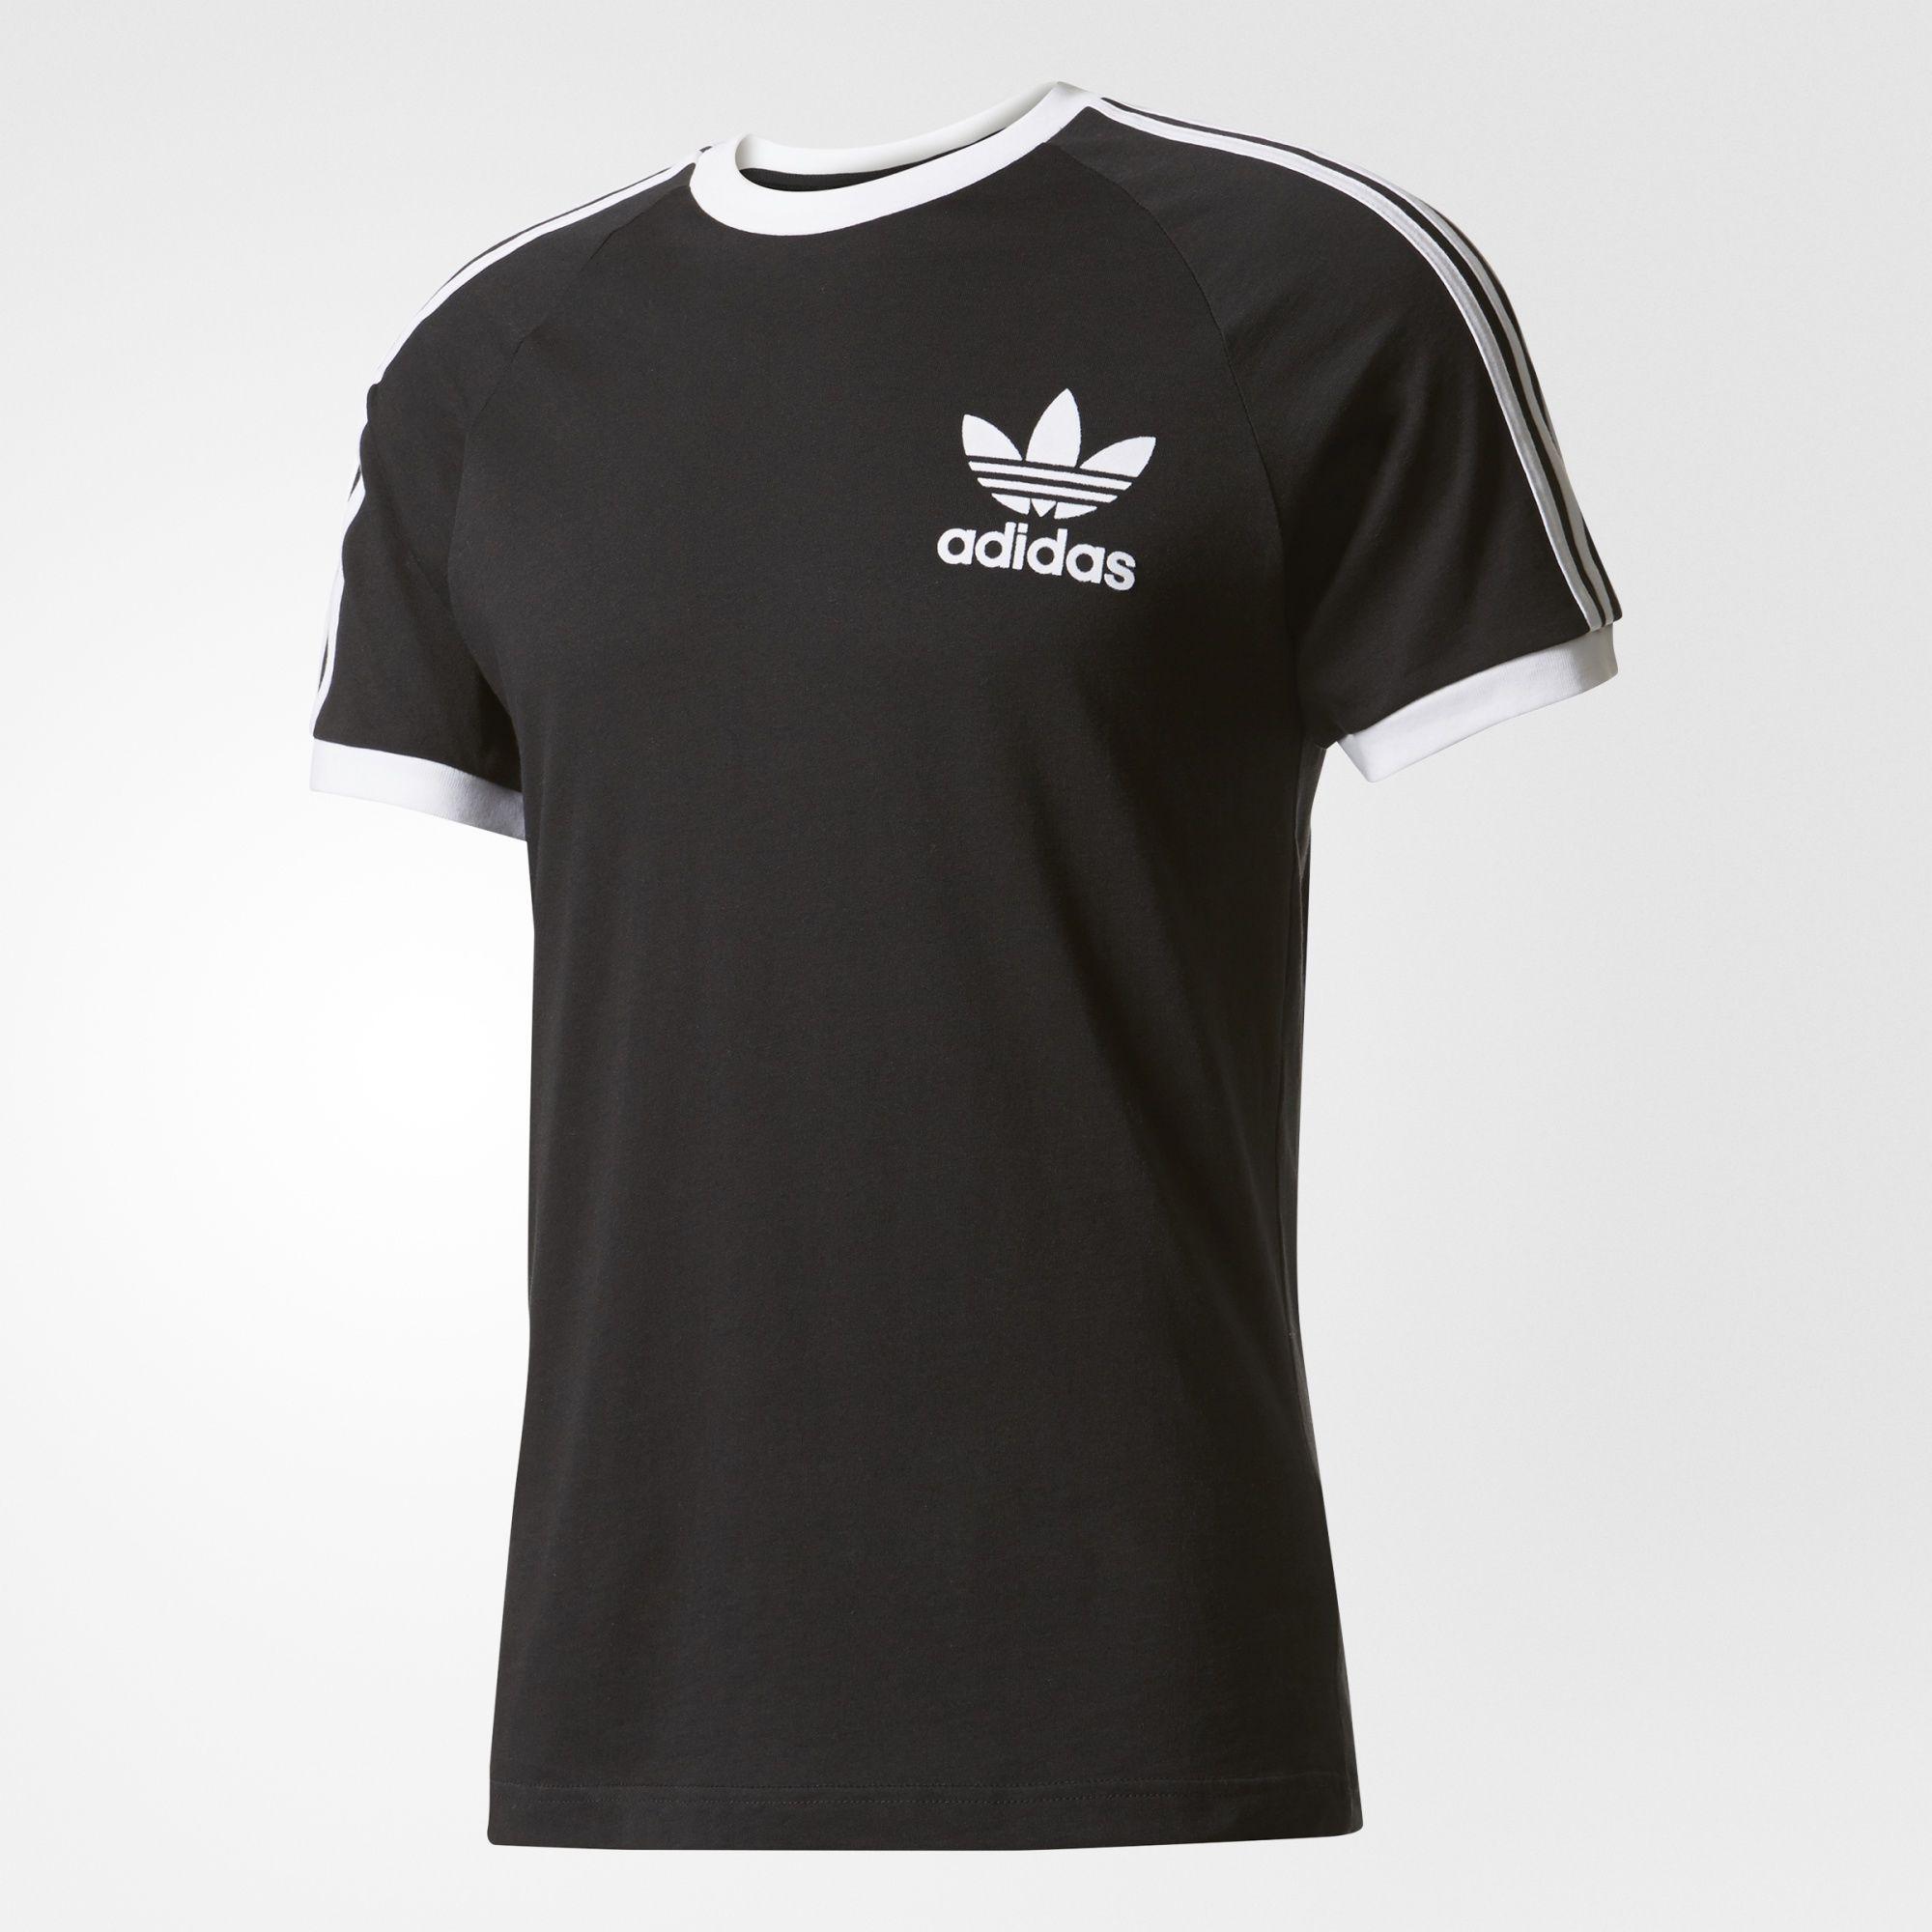 In T Shirt Pinterest ClfnWishlist Adidas 2019 ul13cFJTK